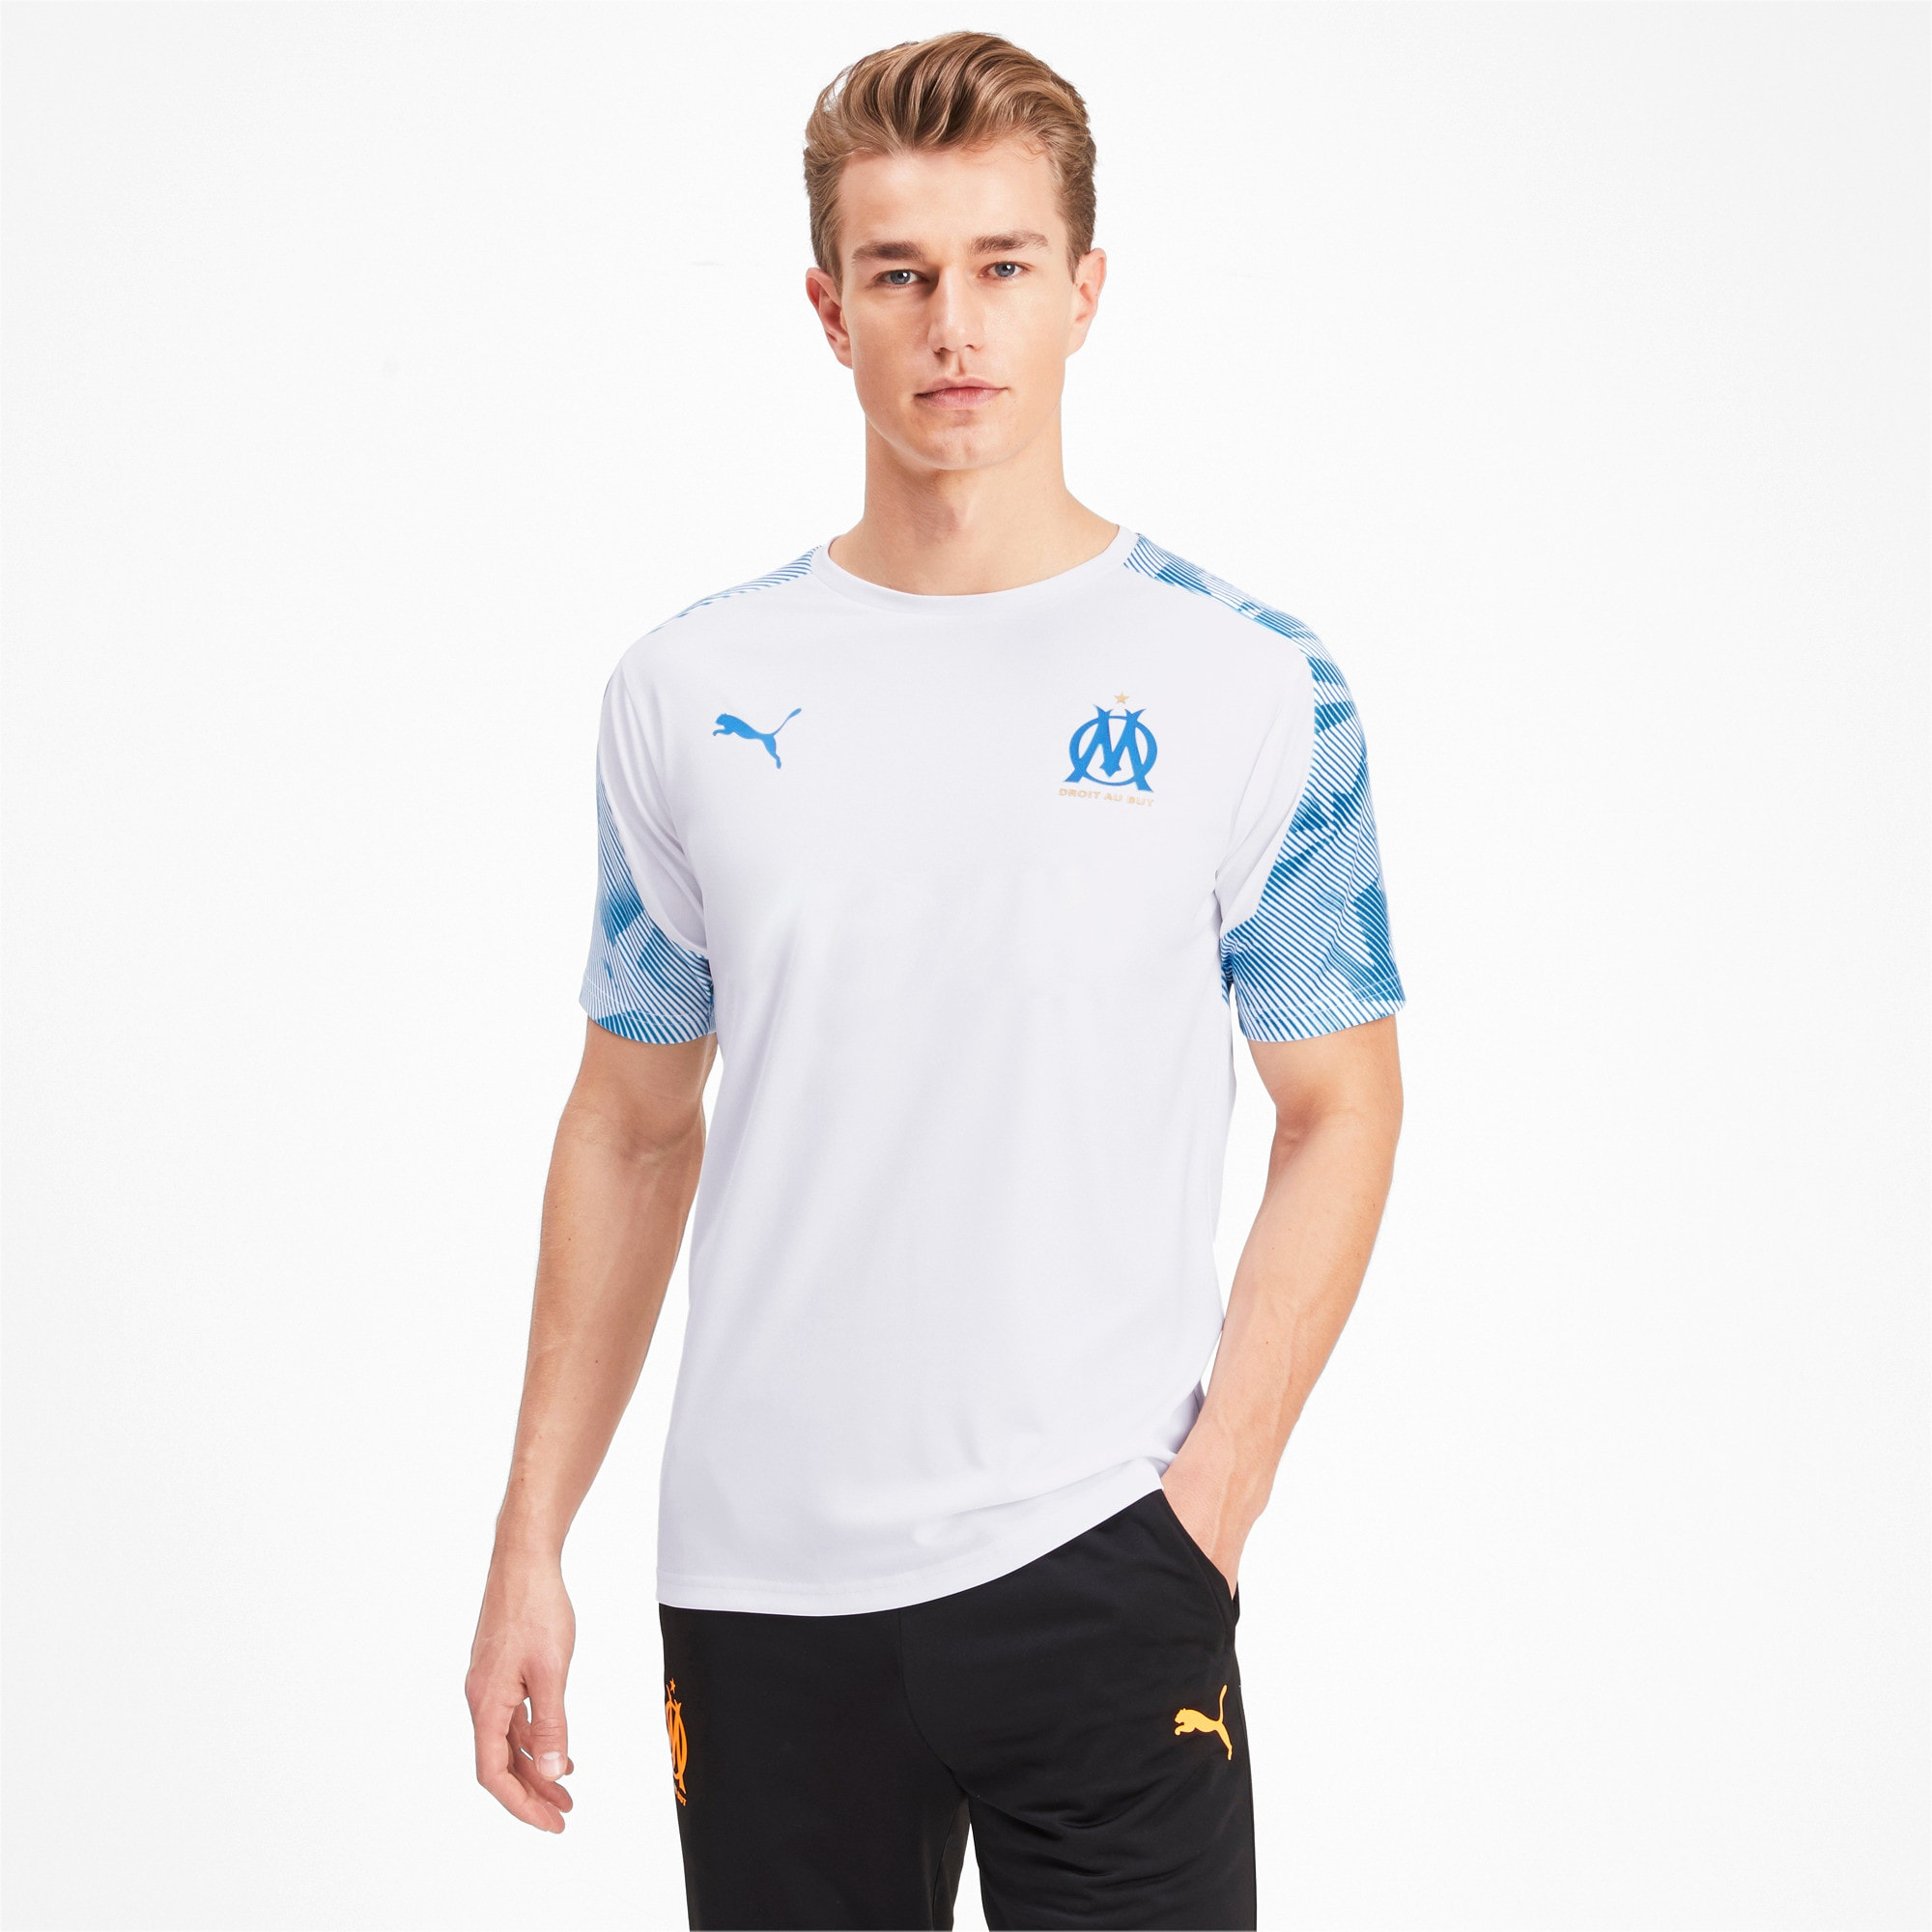 Thumbnail 1 of Olympique de Marseille Herren Trainingstrikot, Puma White-Bleu Azur, medium